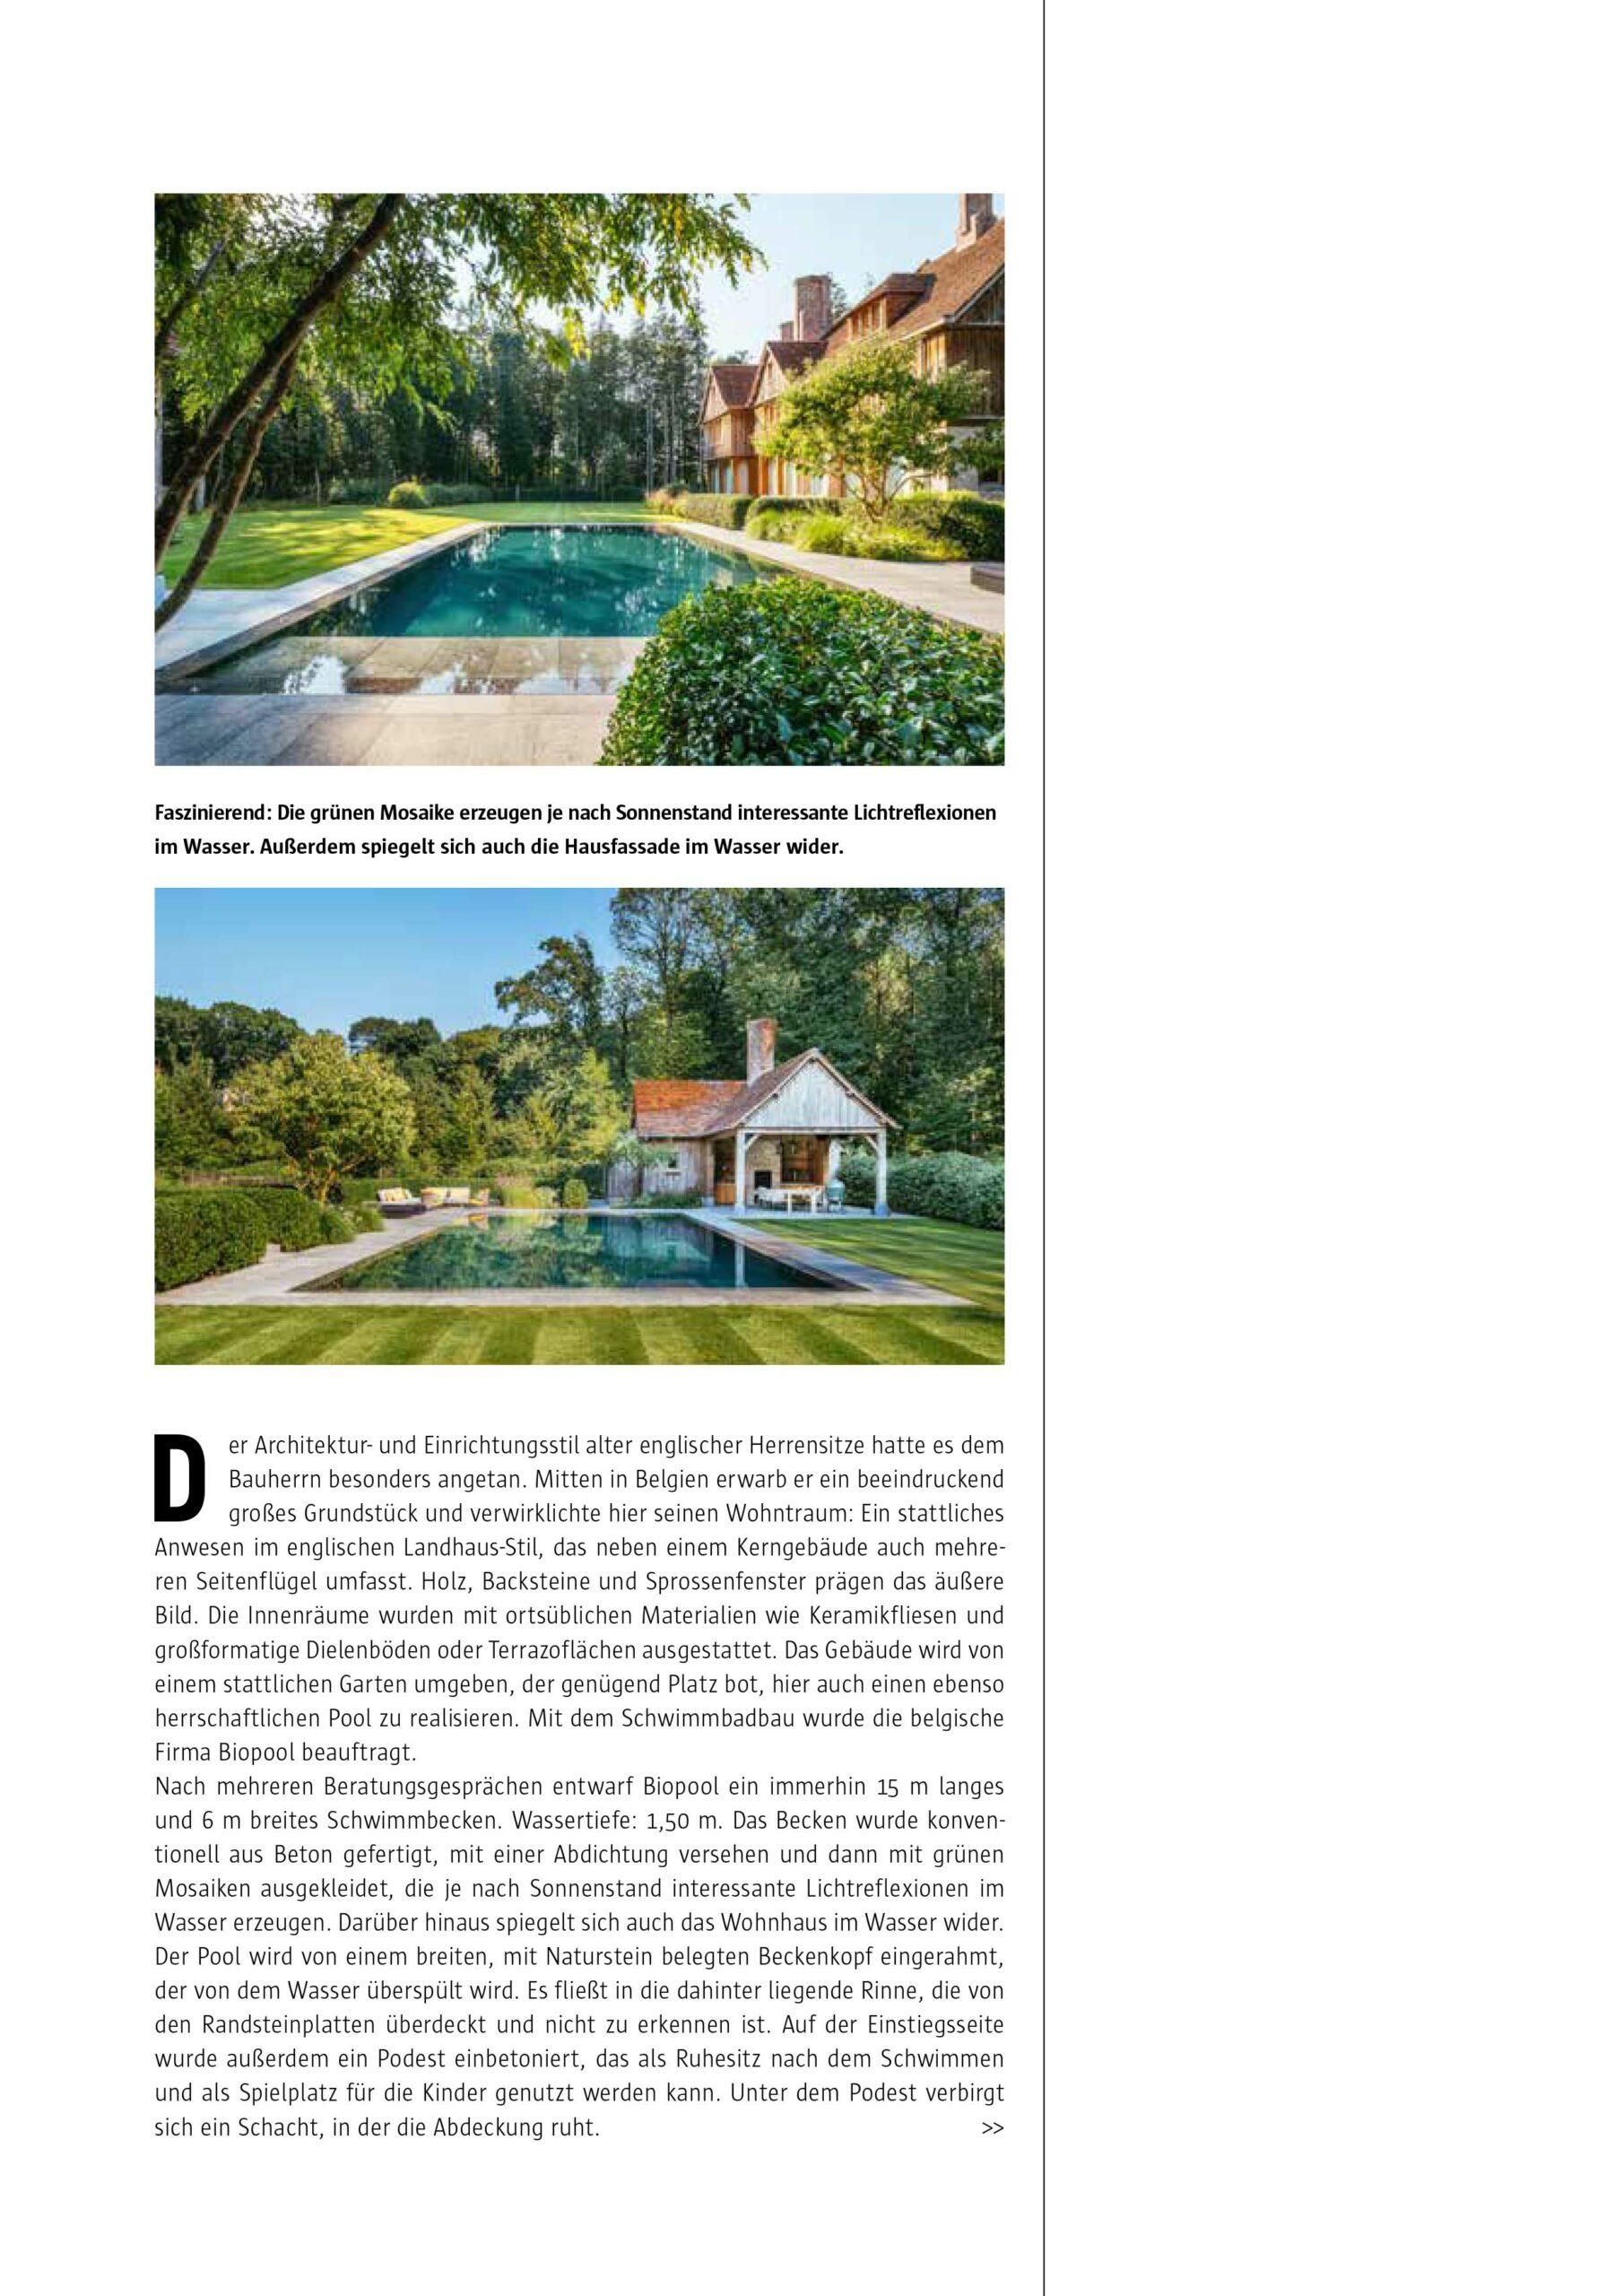 Afbeelding nieuwsitem Reportage Spa & Home – Very British